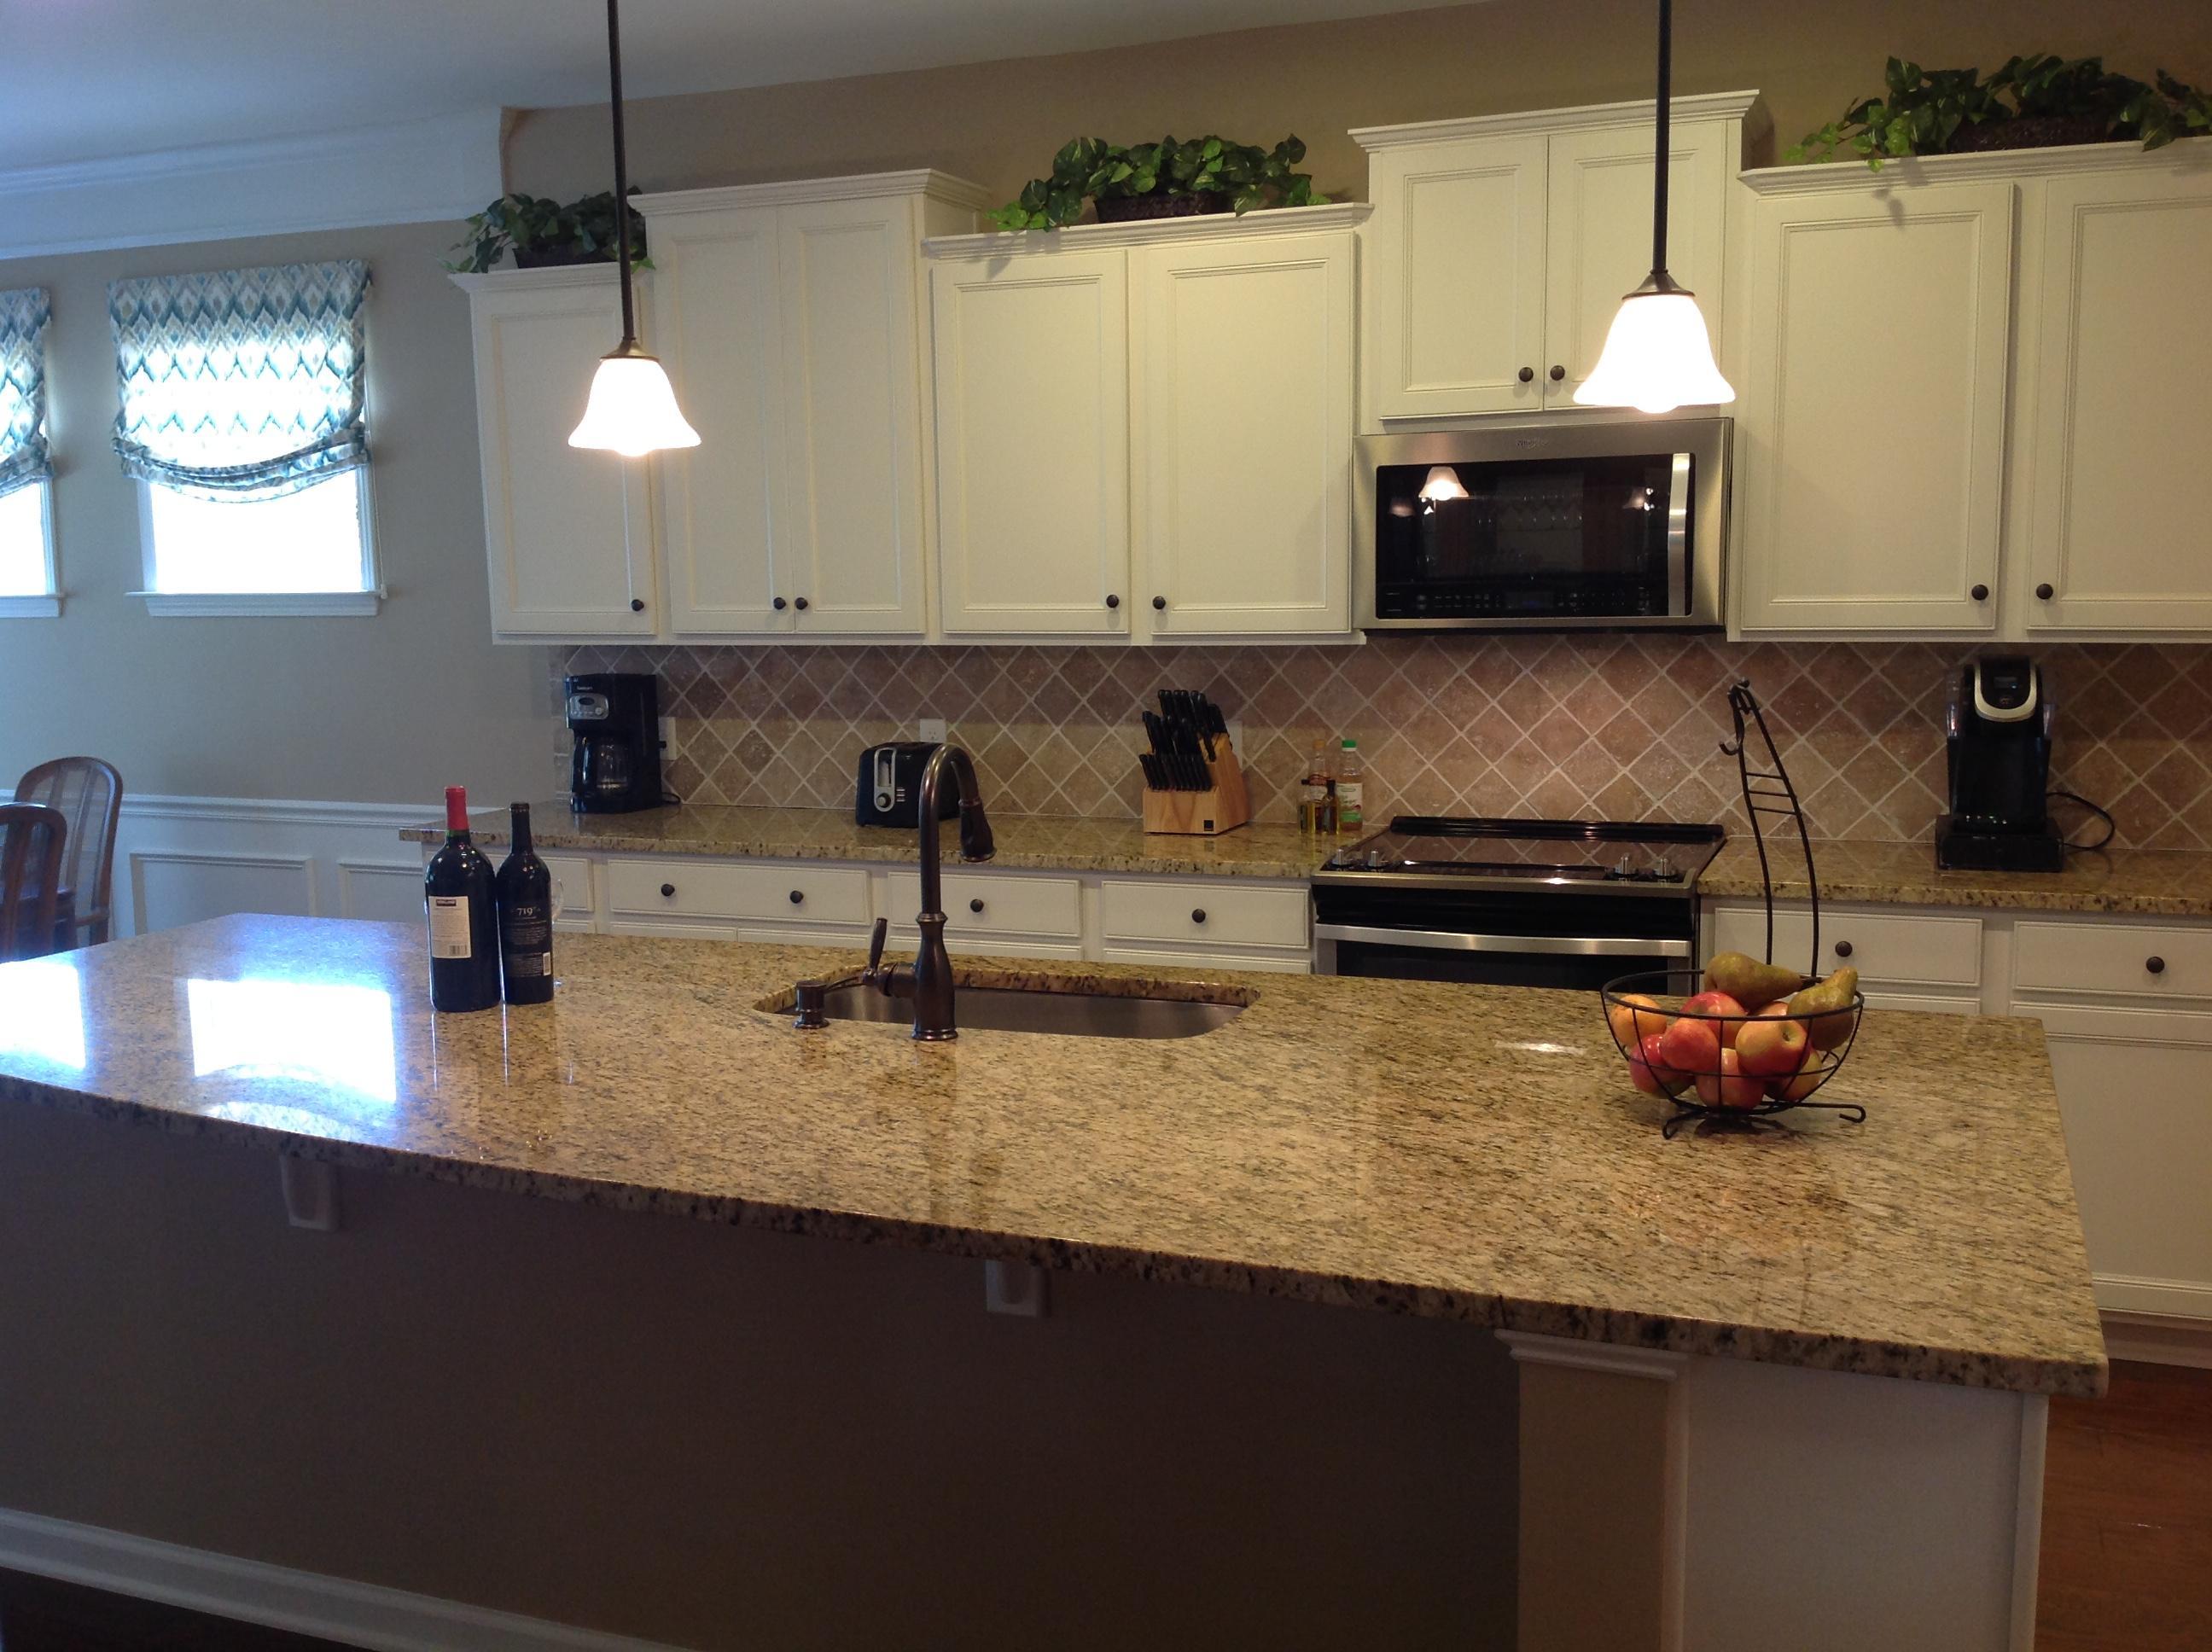 Cane Bay Plantation Homes For Sale - 547 Eastern Isle, Summerville, SC - 5